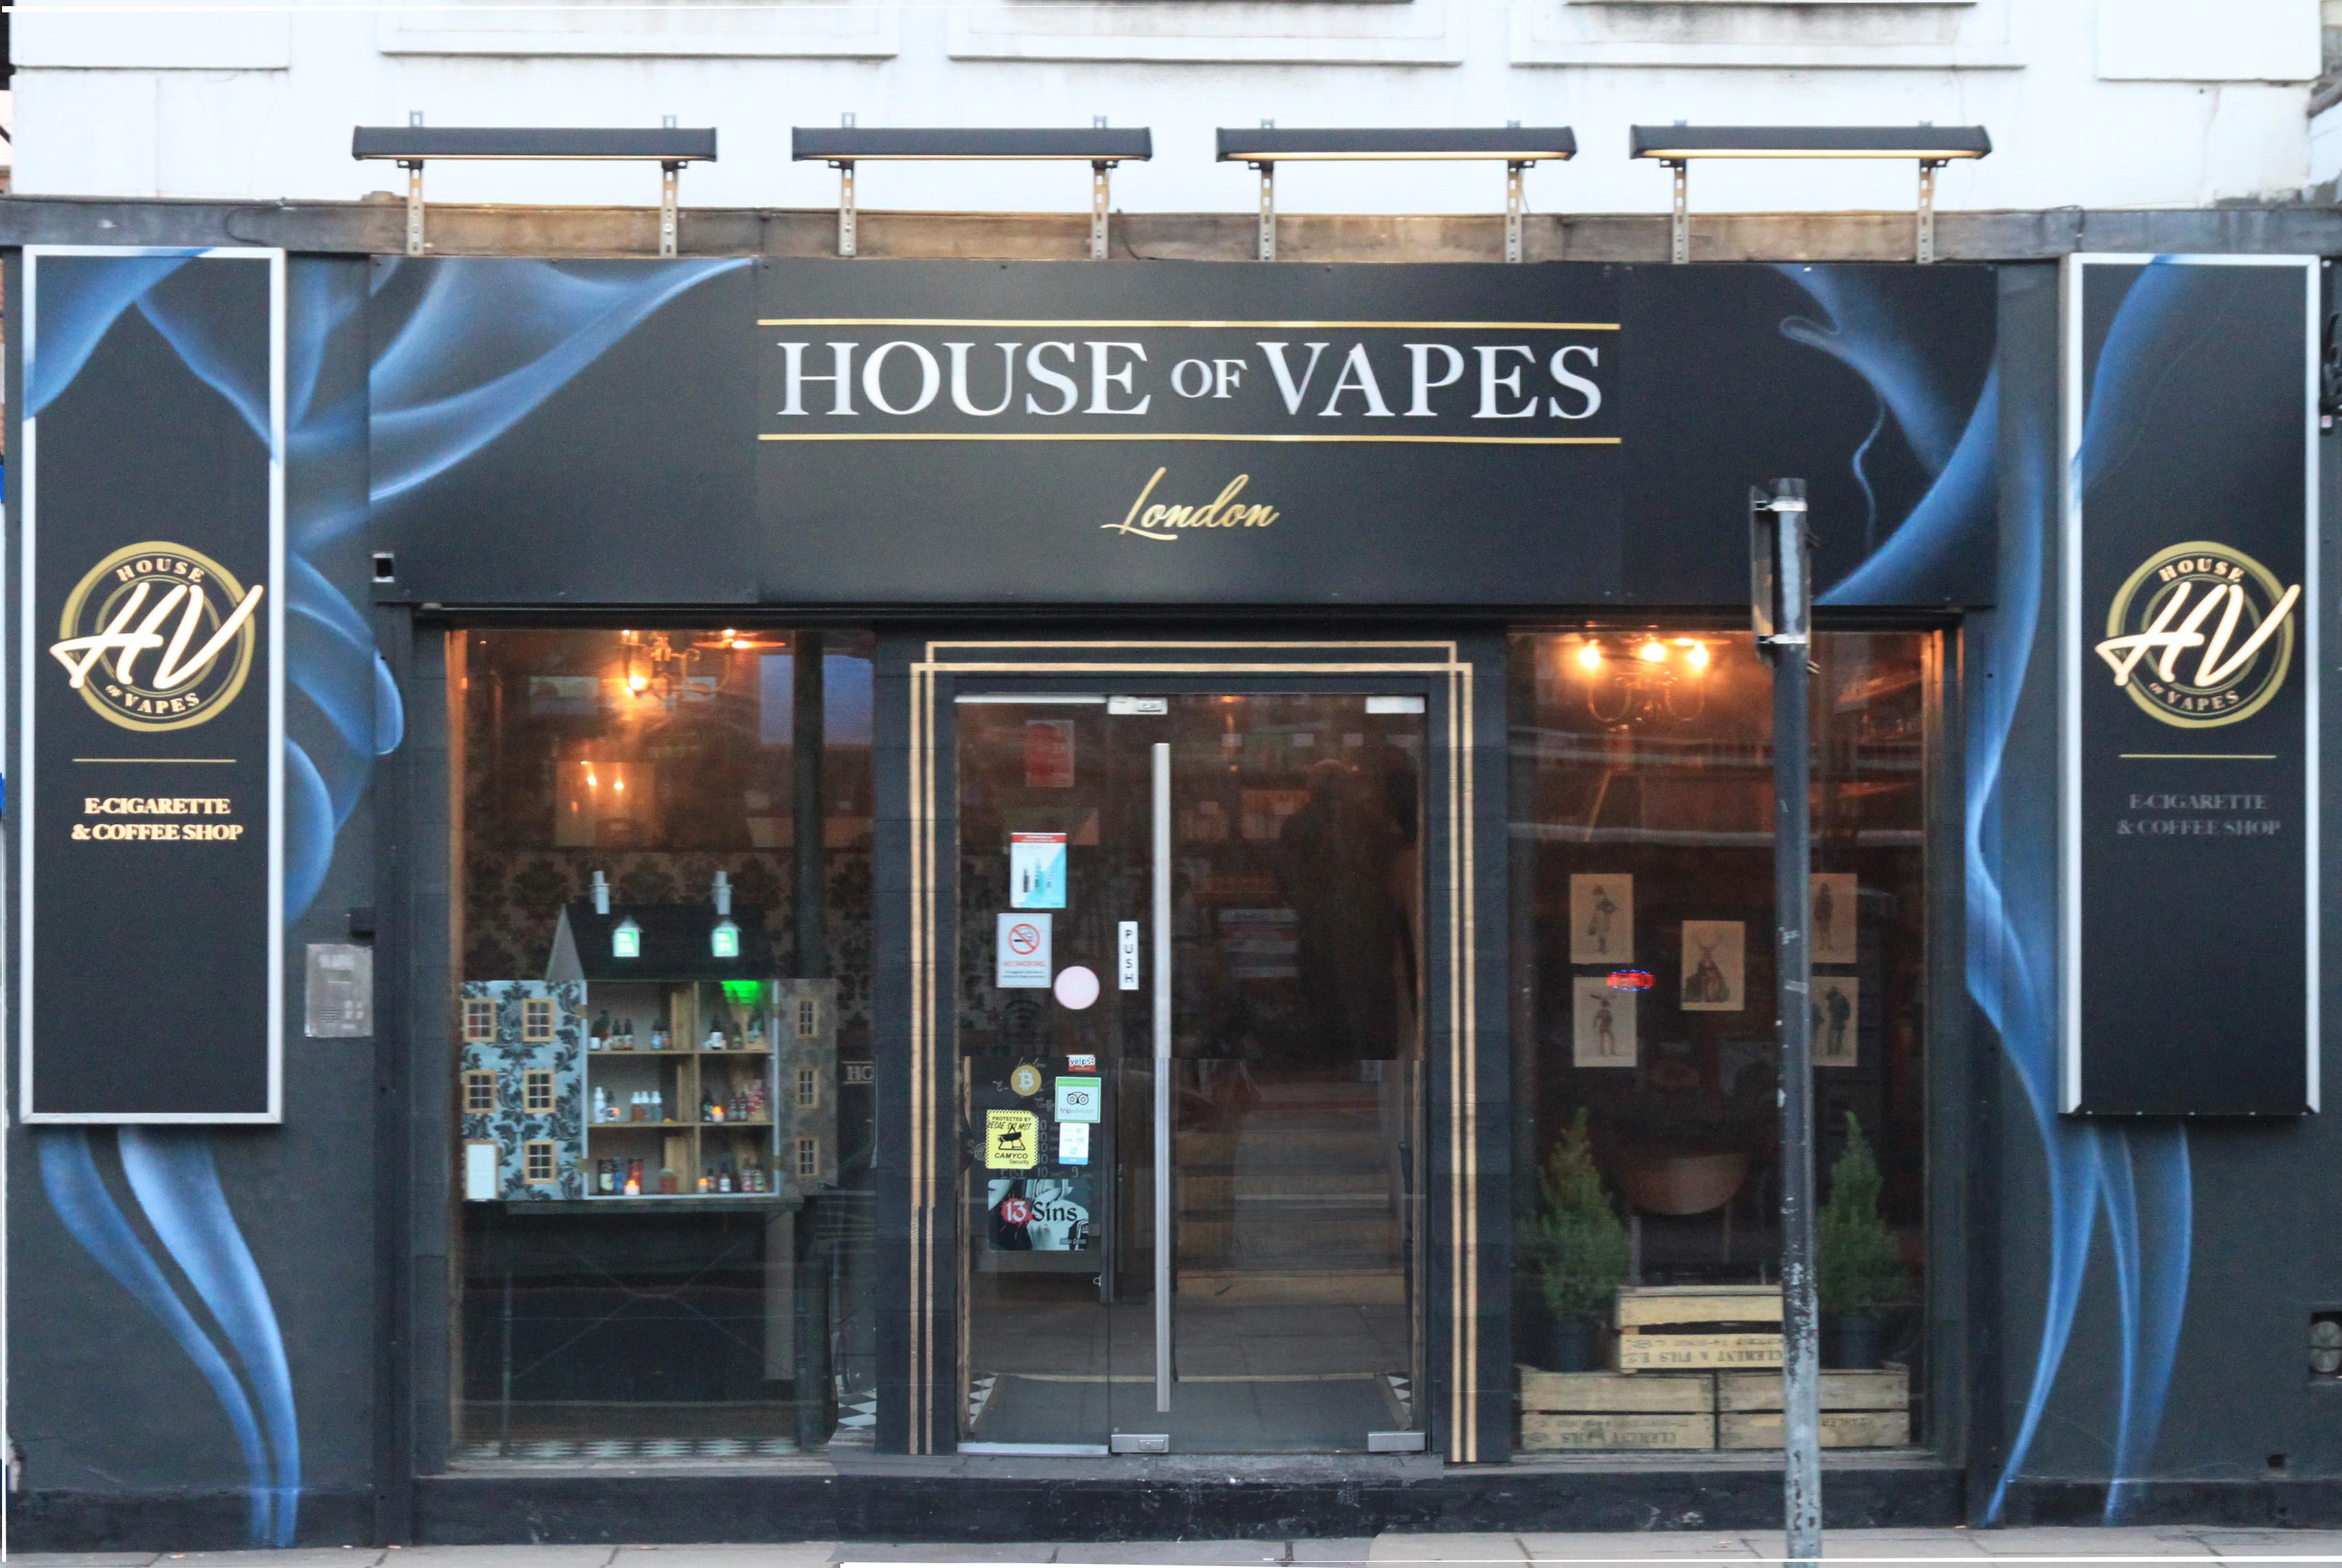 The Best Vape Shops in London | Vapebeat